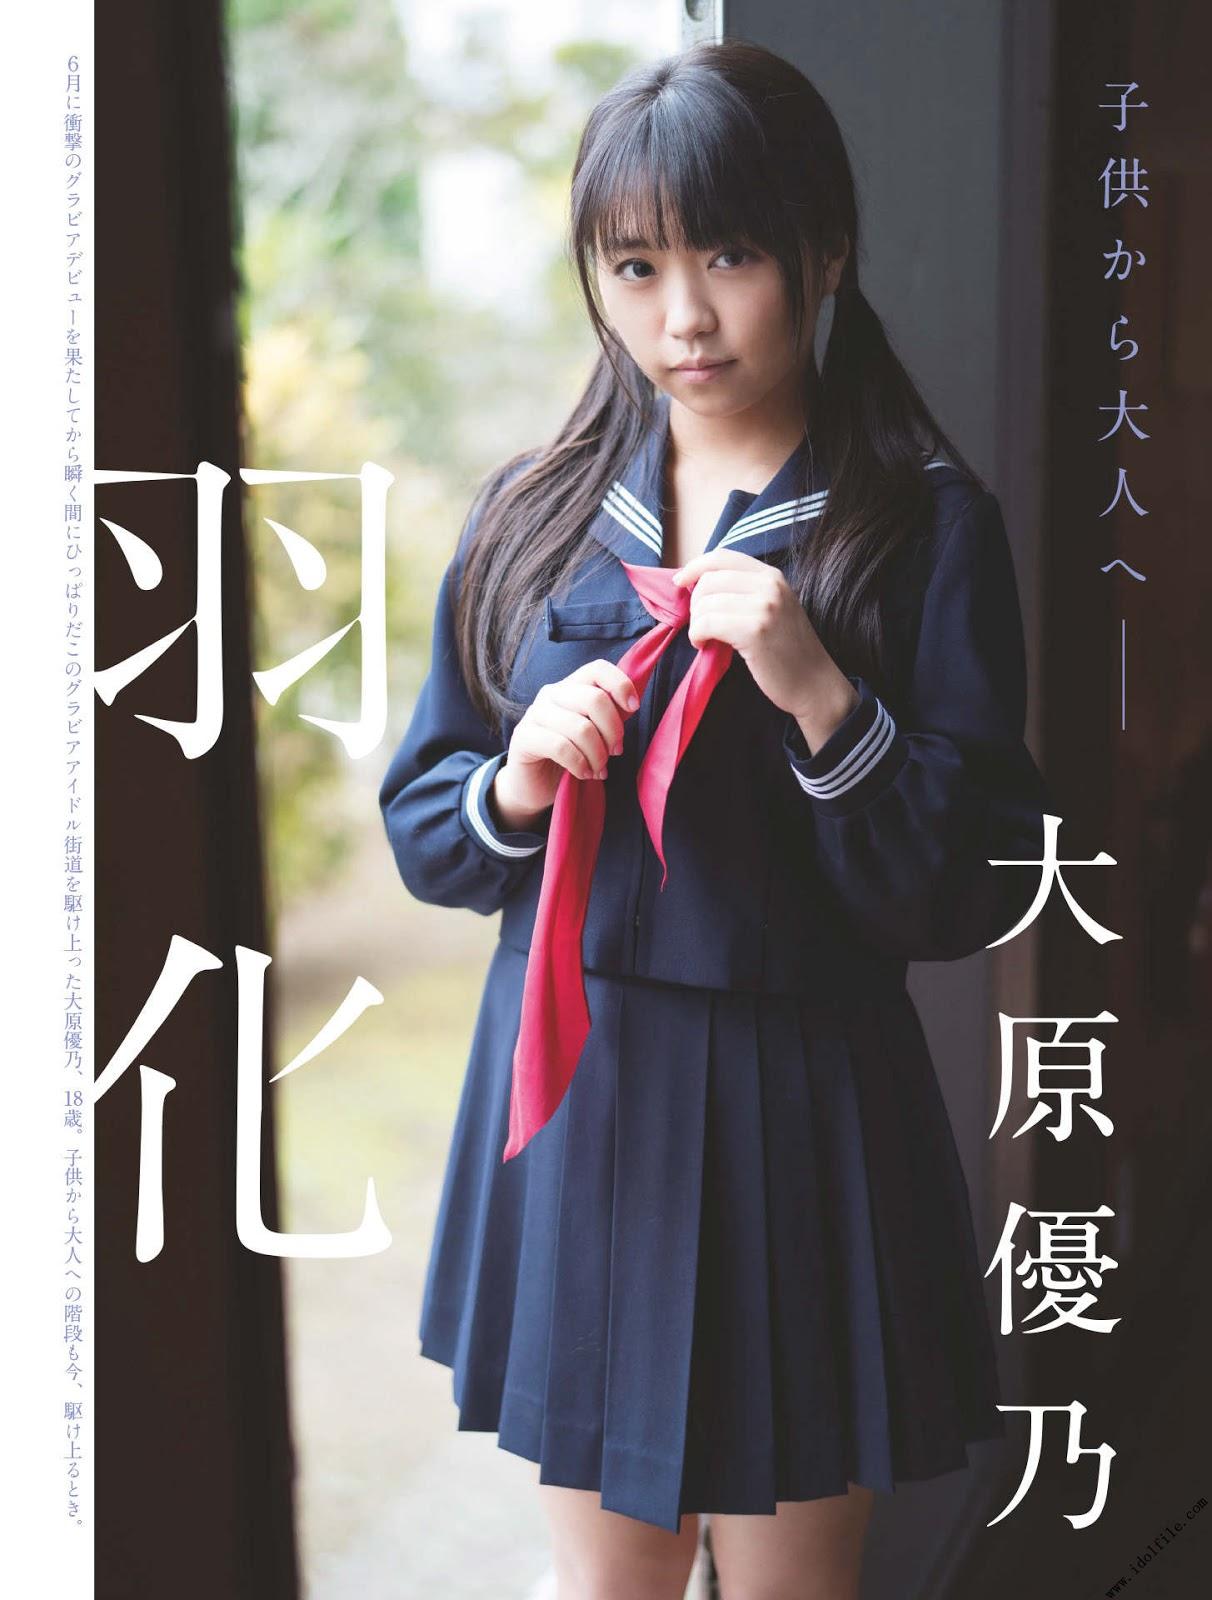 Yuno Ohara 大原優乃, Platinum FLASH 2017 vol.2 (プラチナフラッシュ 2017 vol.2)